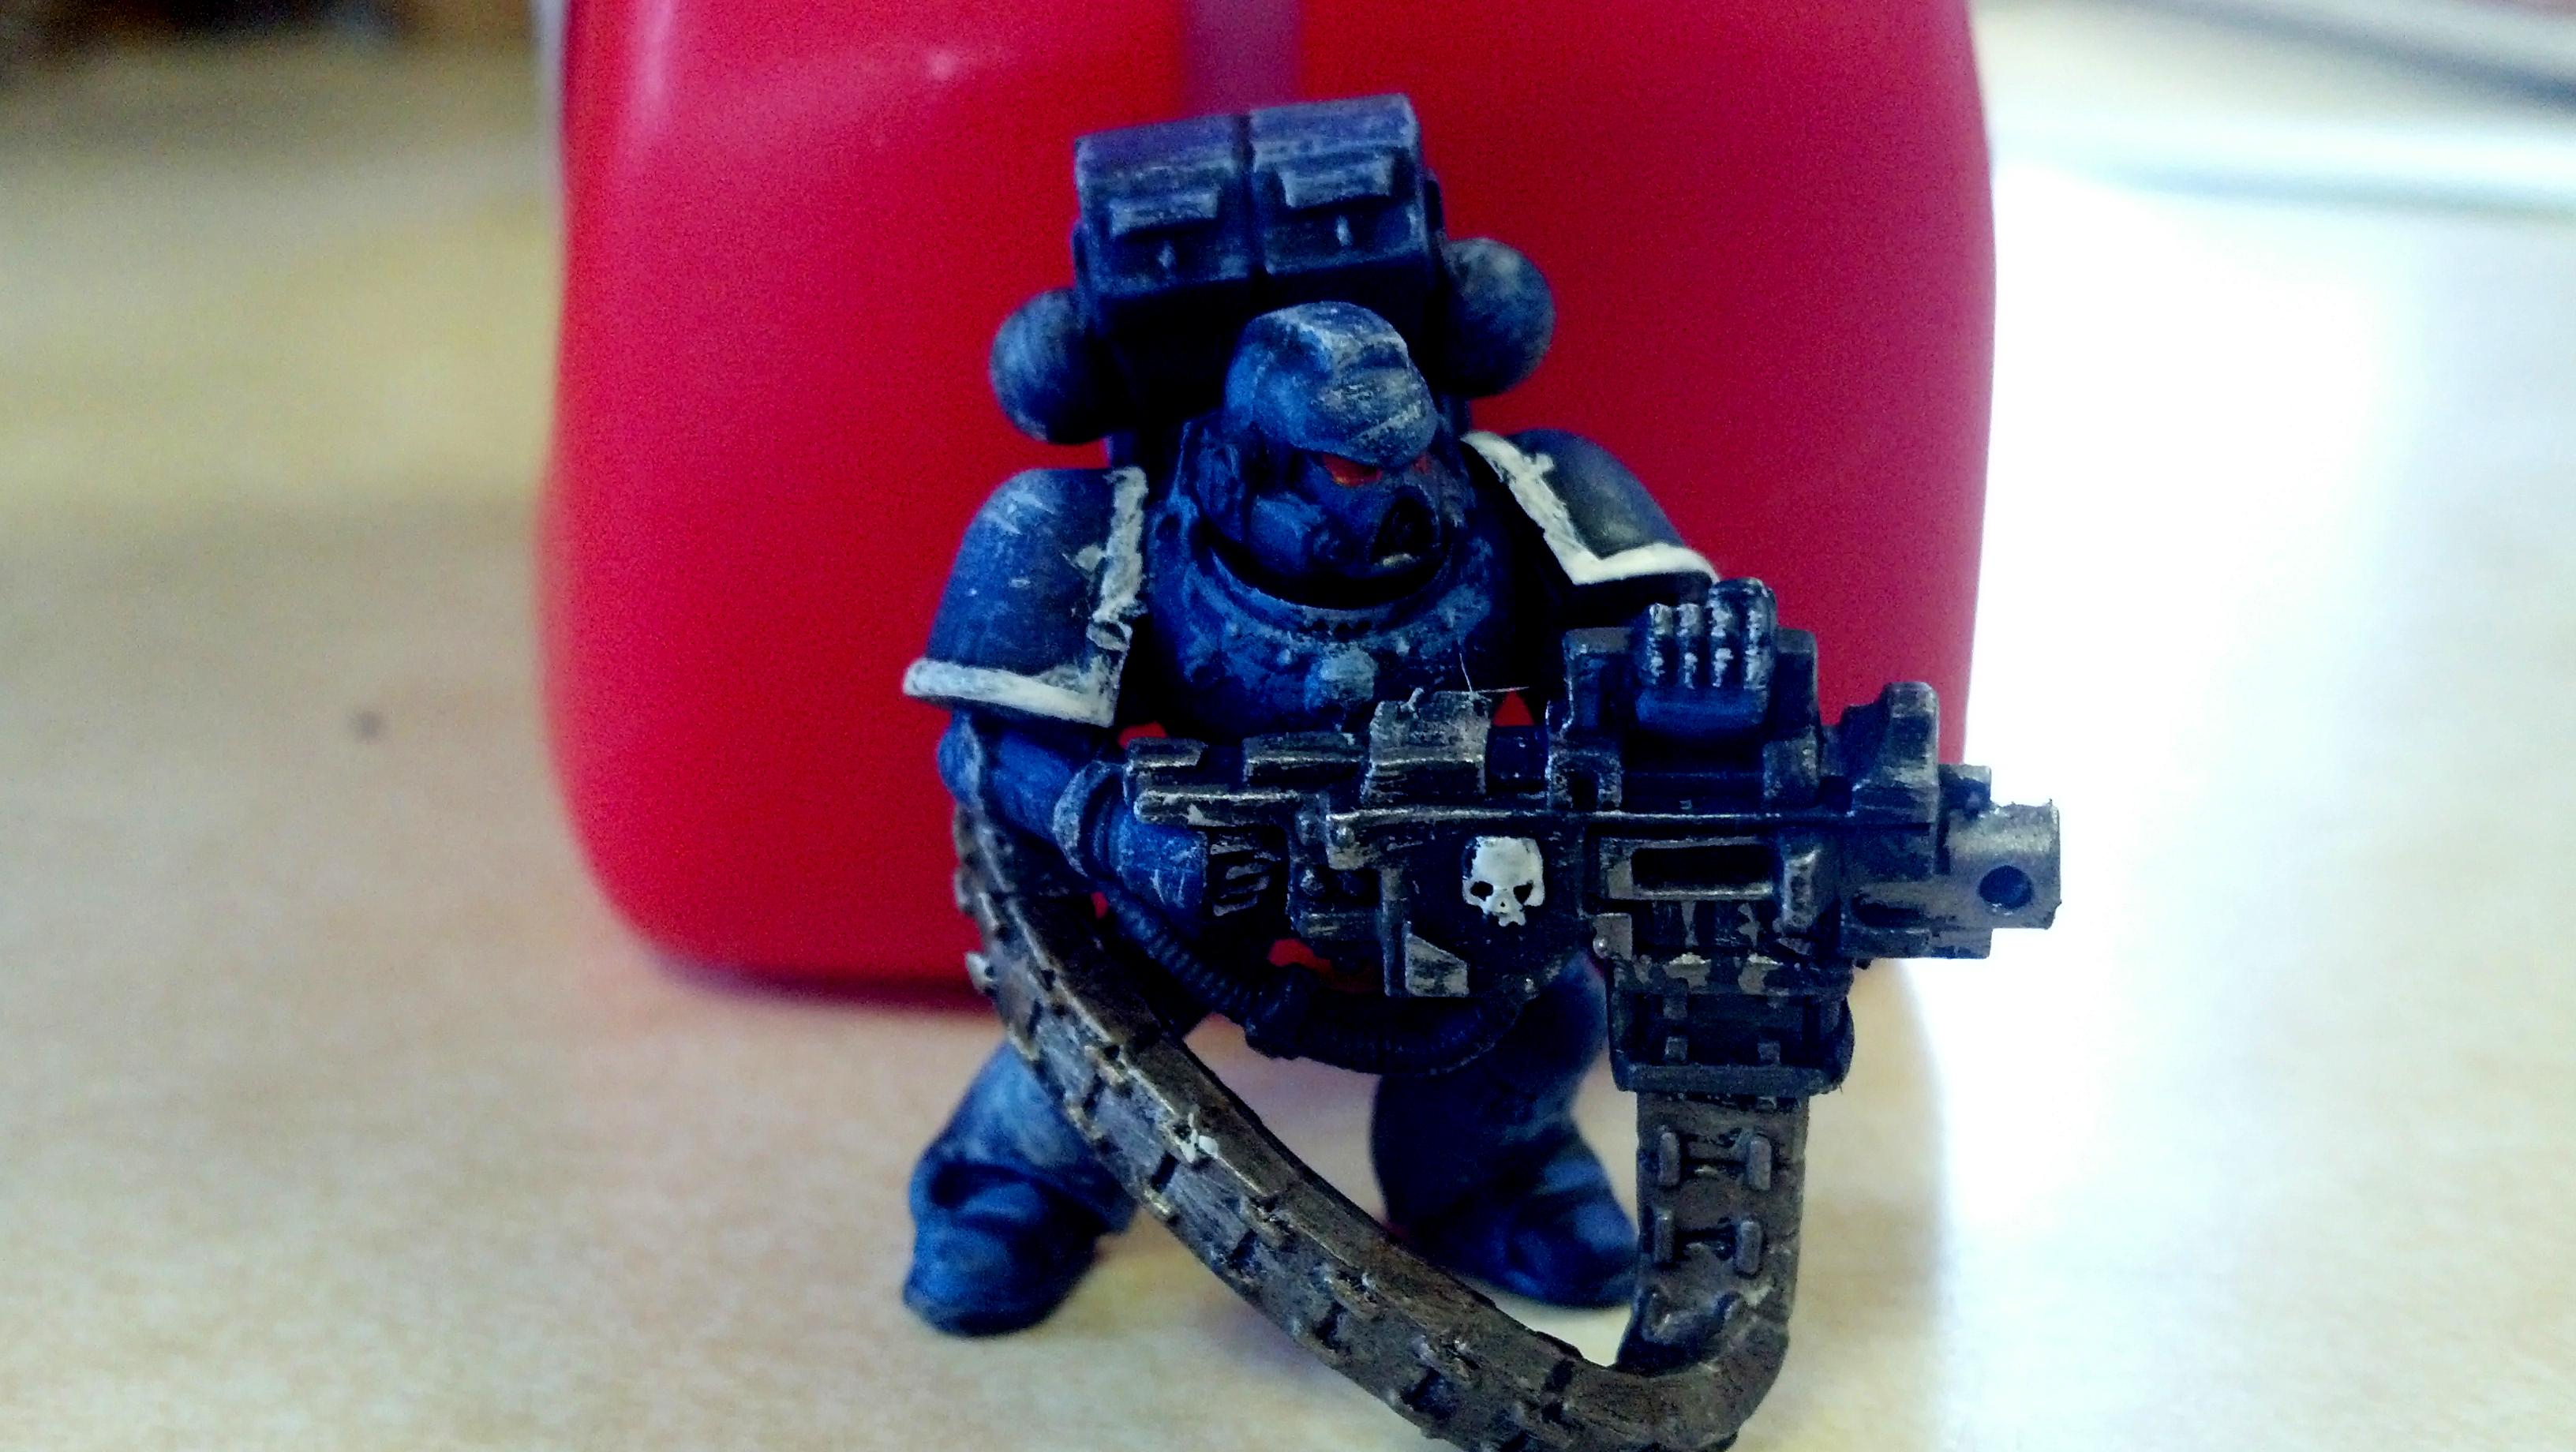 Space, Space Marines, Ultra, Ultramarines, Warhammer 40,000, Warhammer Fantasy